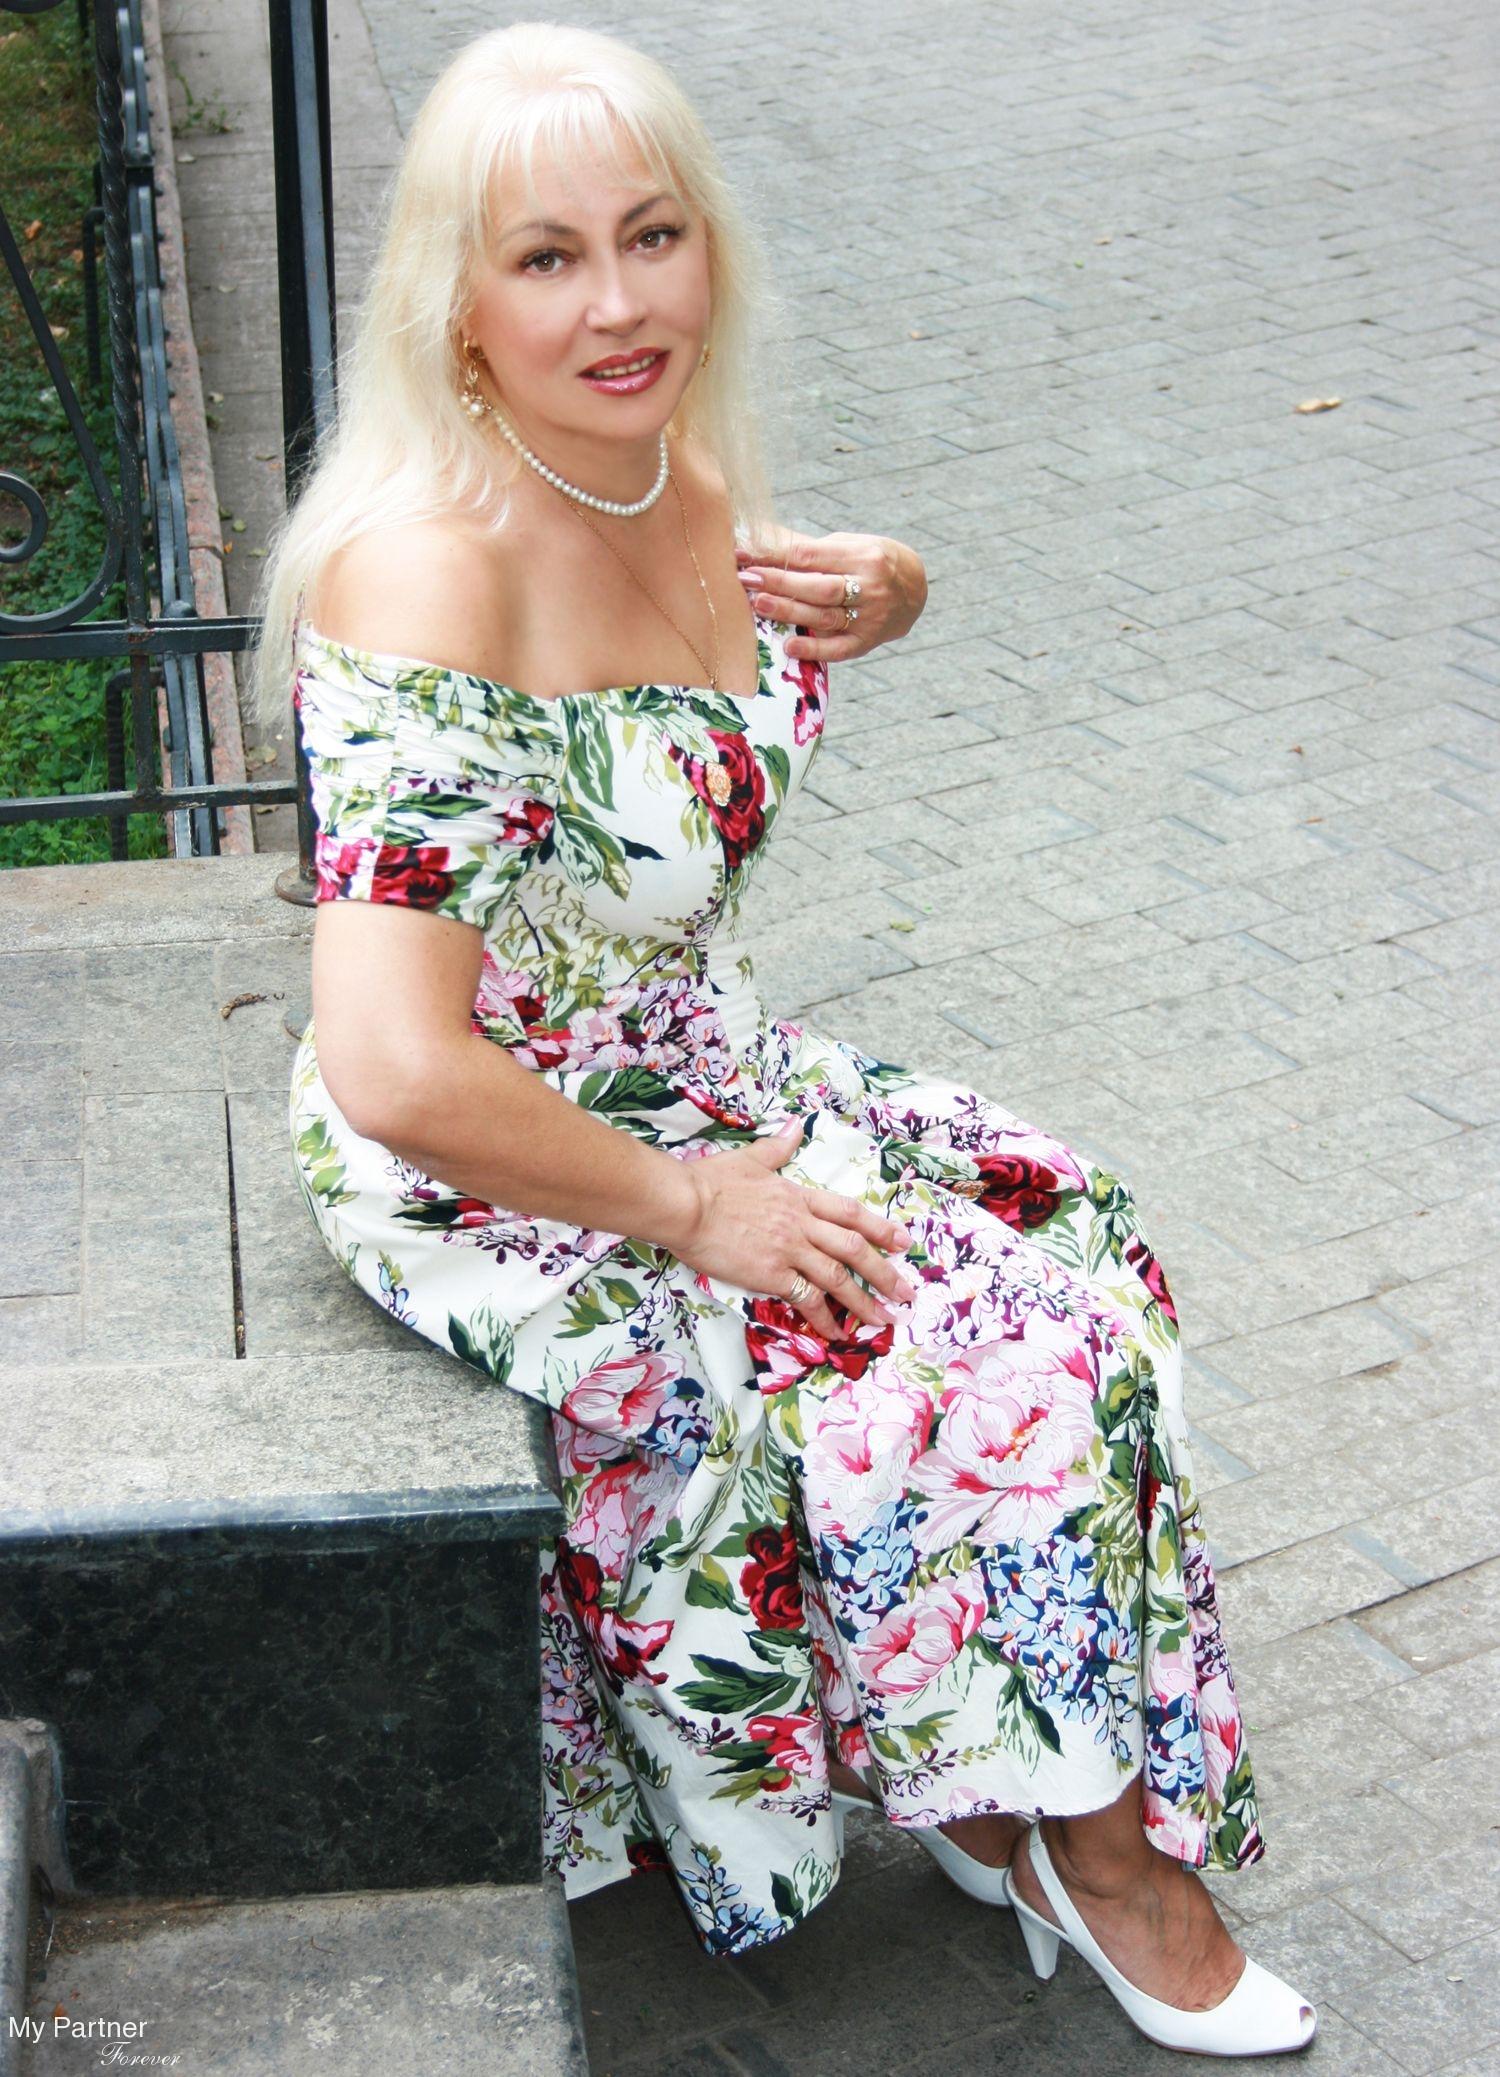 Dating Site to Meet Stunning Ukrainian Lady Olga from Odessa, Ukraine